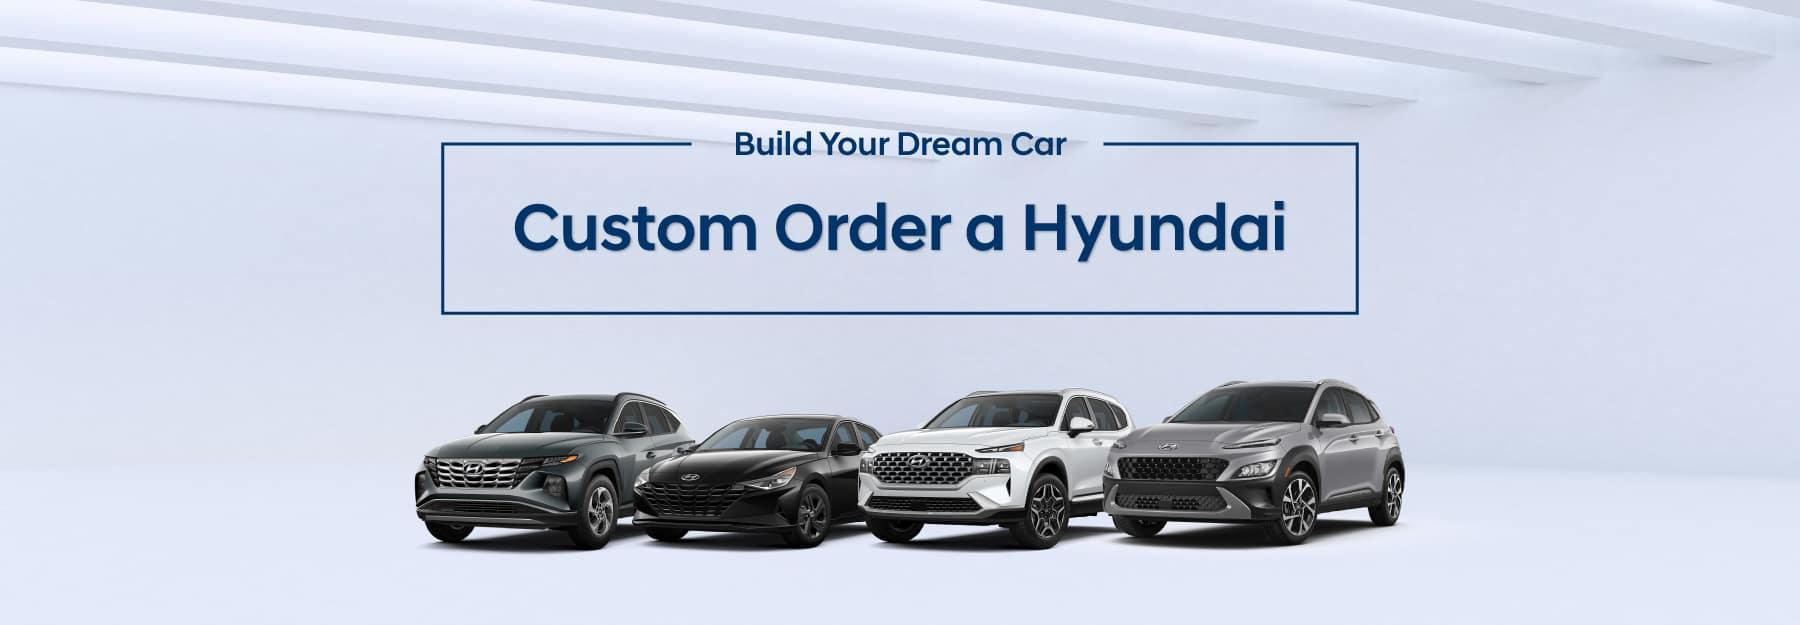 Build Your Dream Car - Custom Order a Hyundai from ABC Hyundai